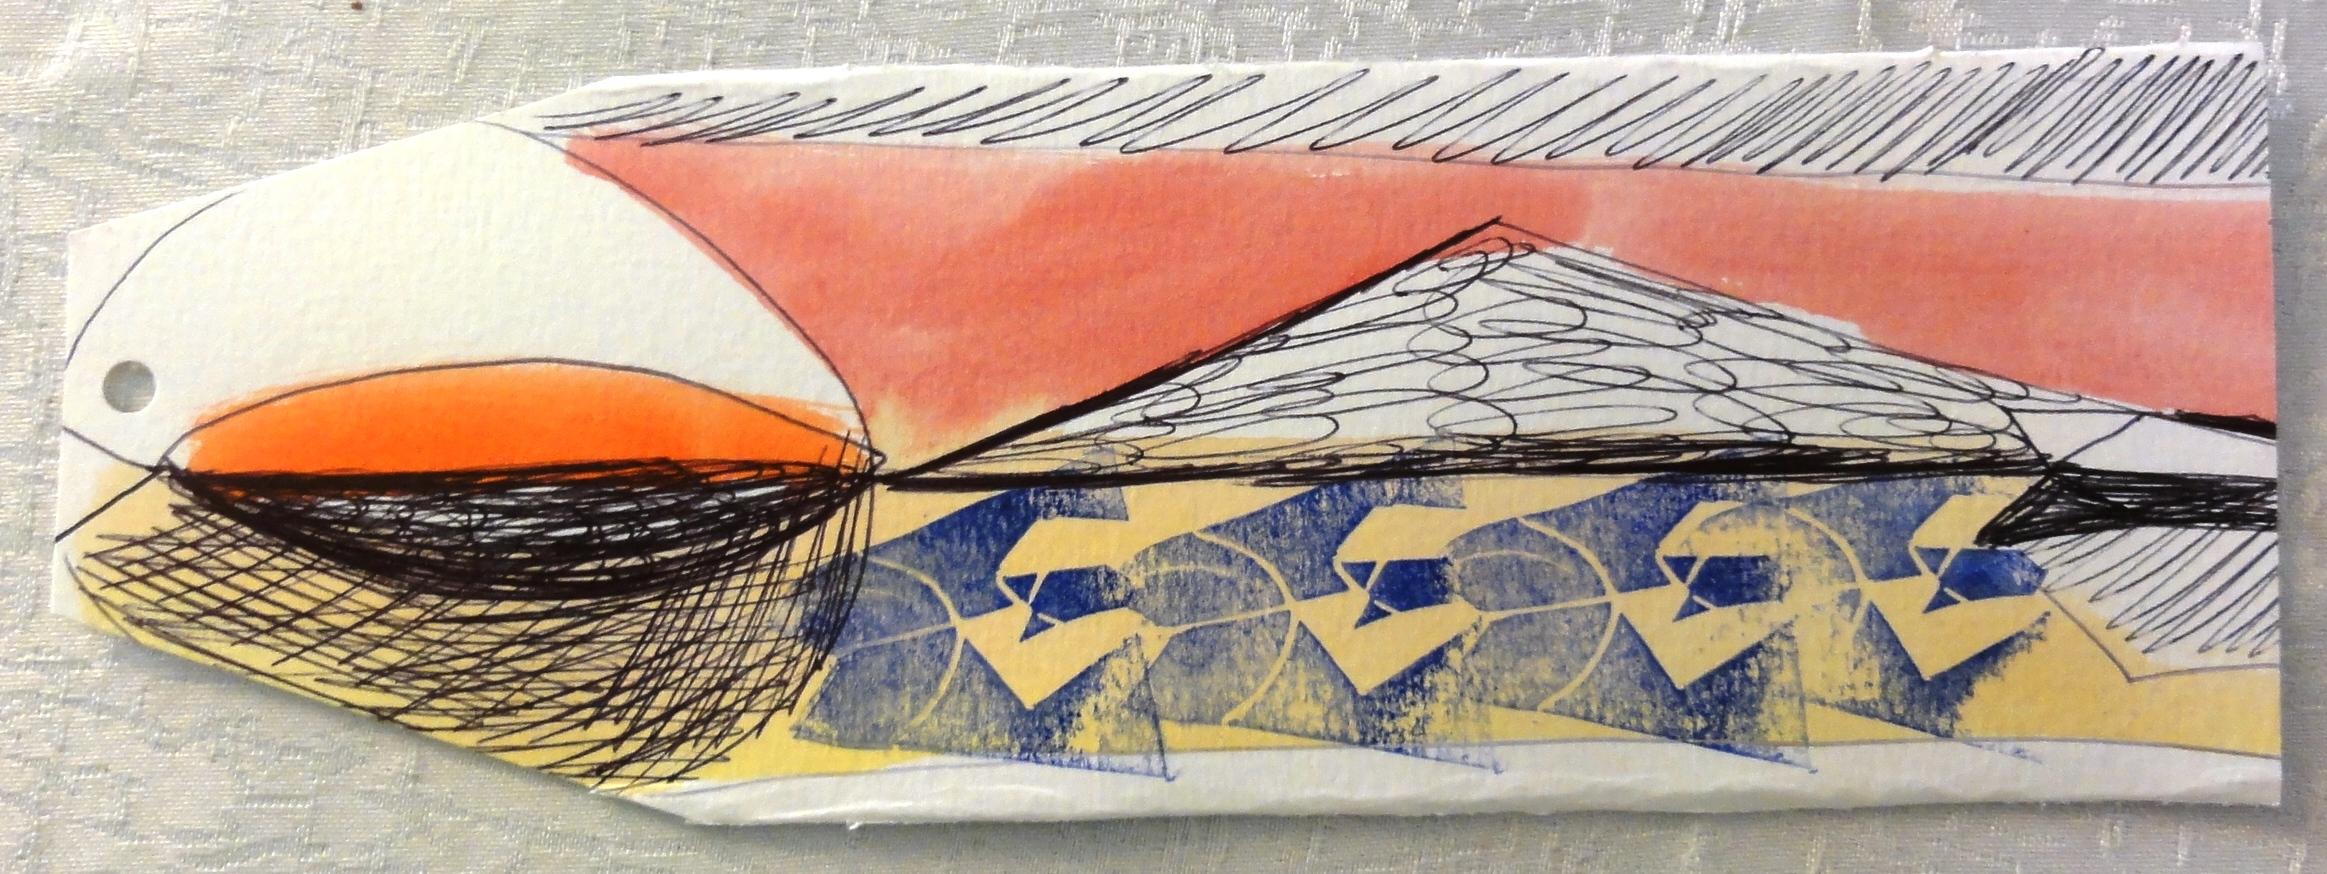 mail art from Mirta Caccaro